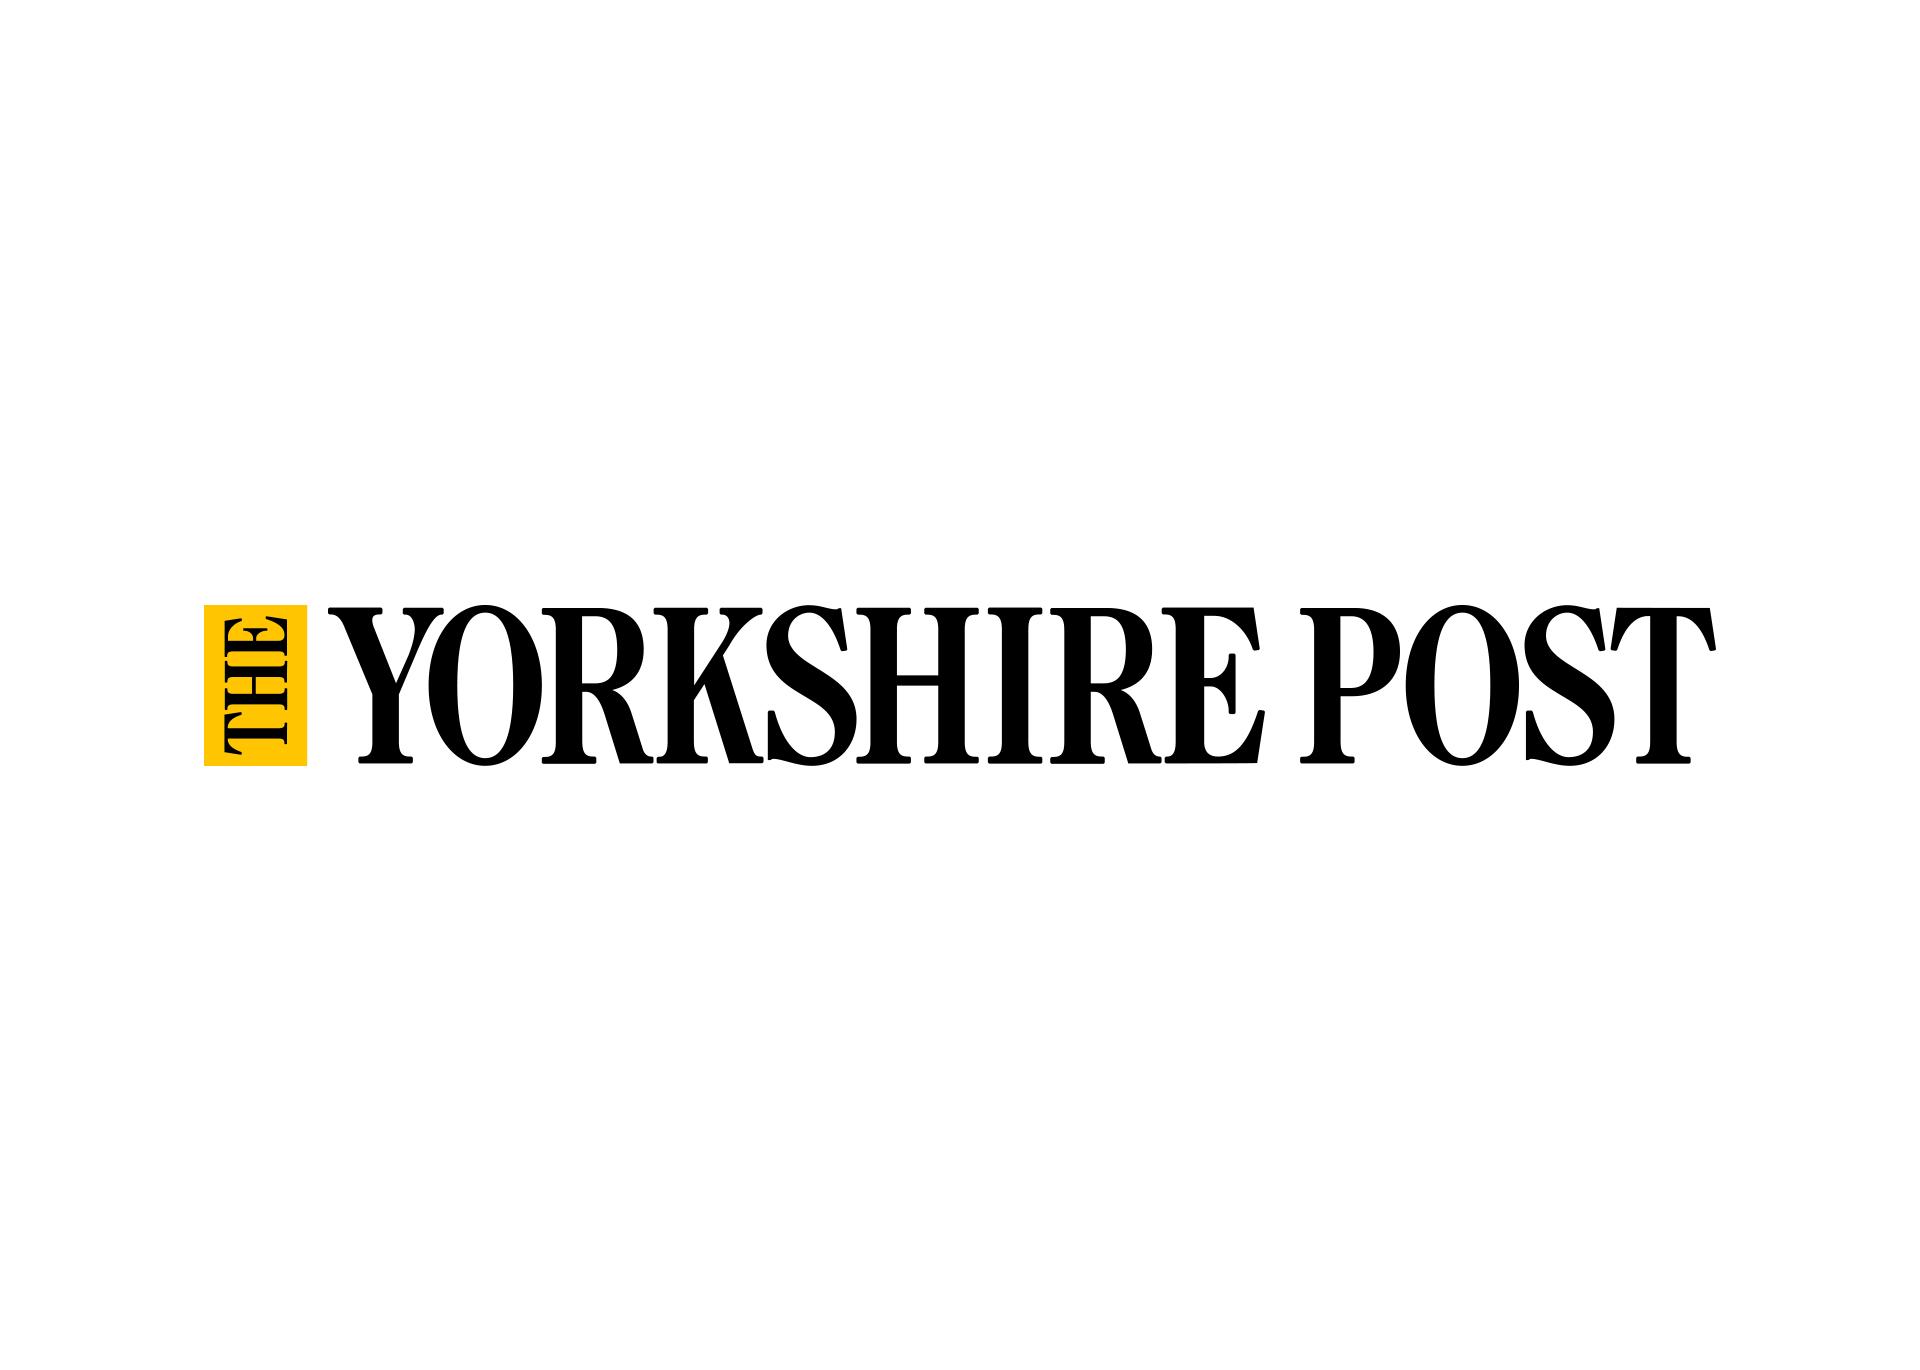 yorkshire post logo.png